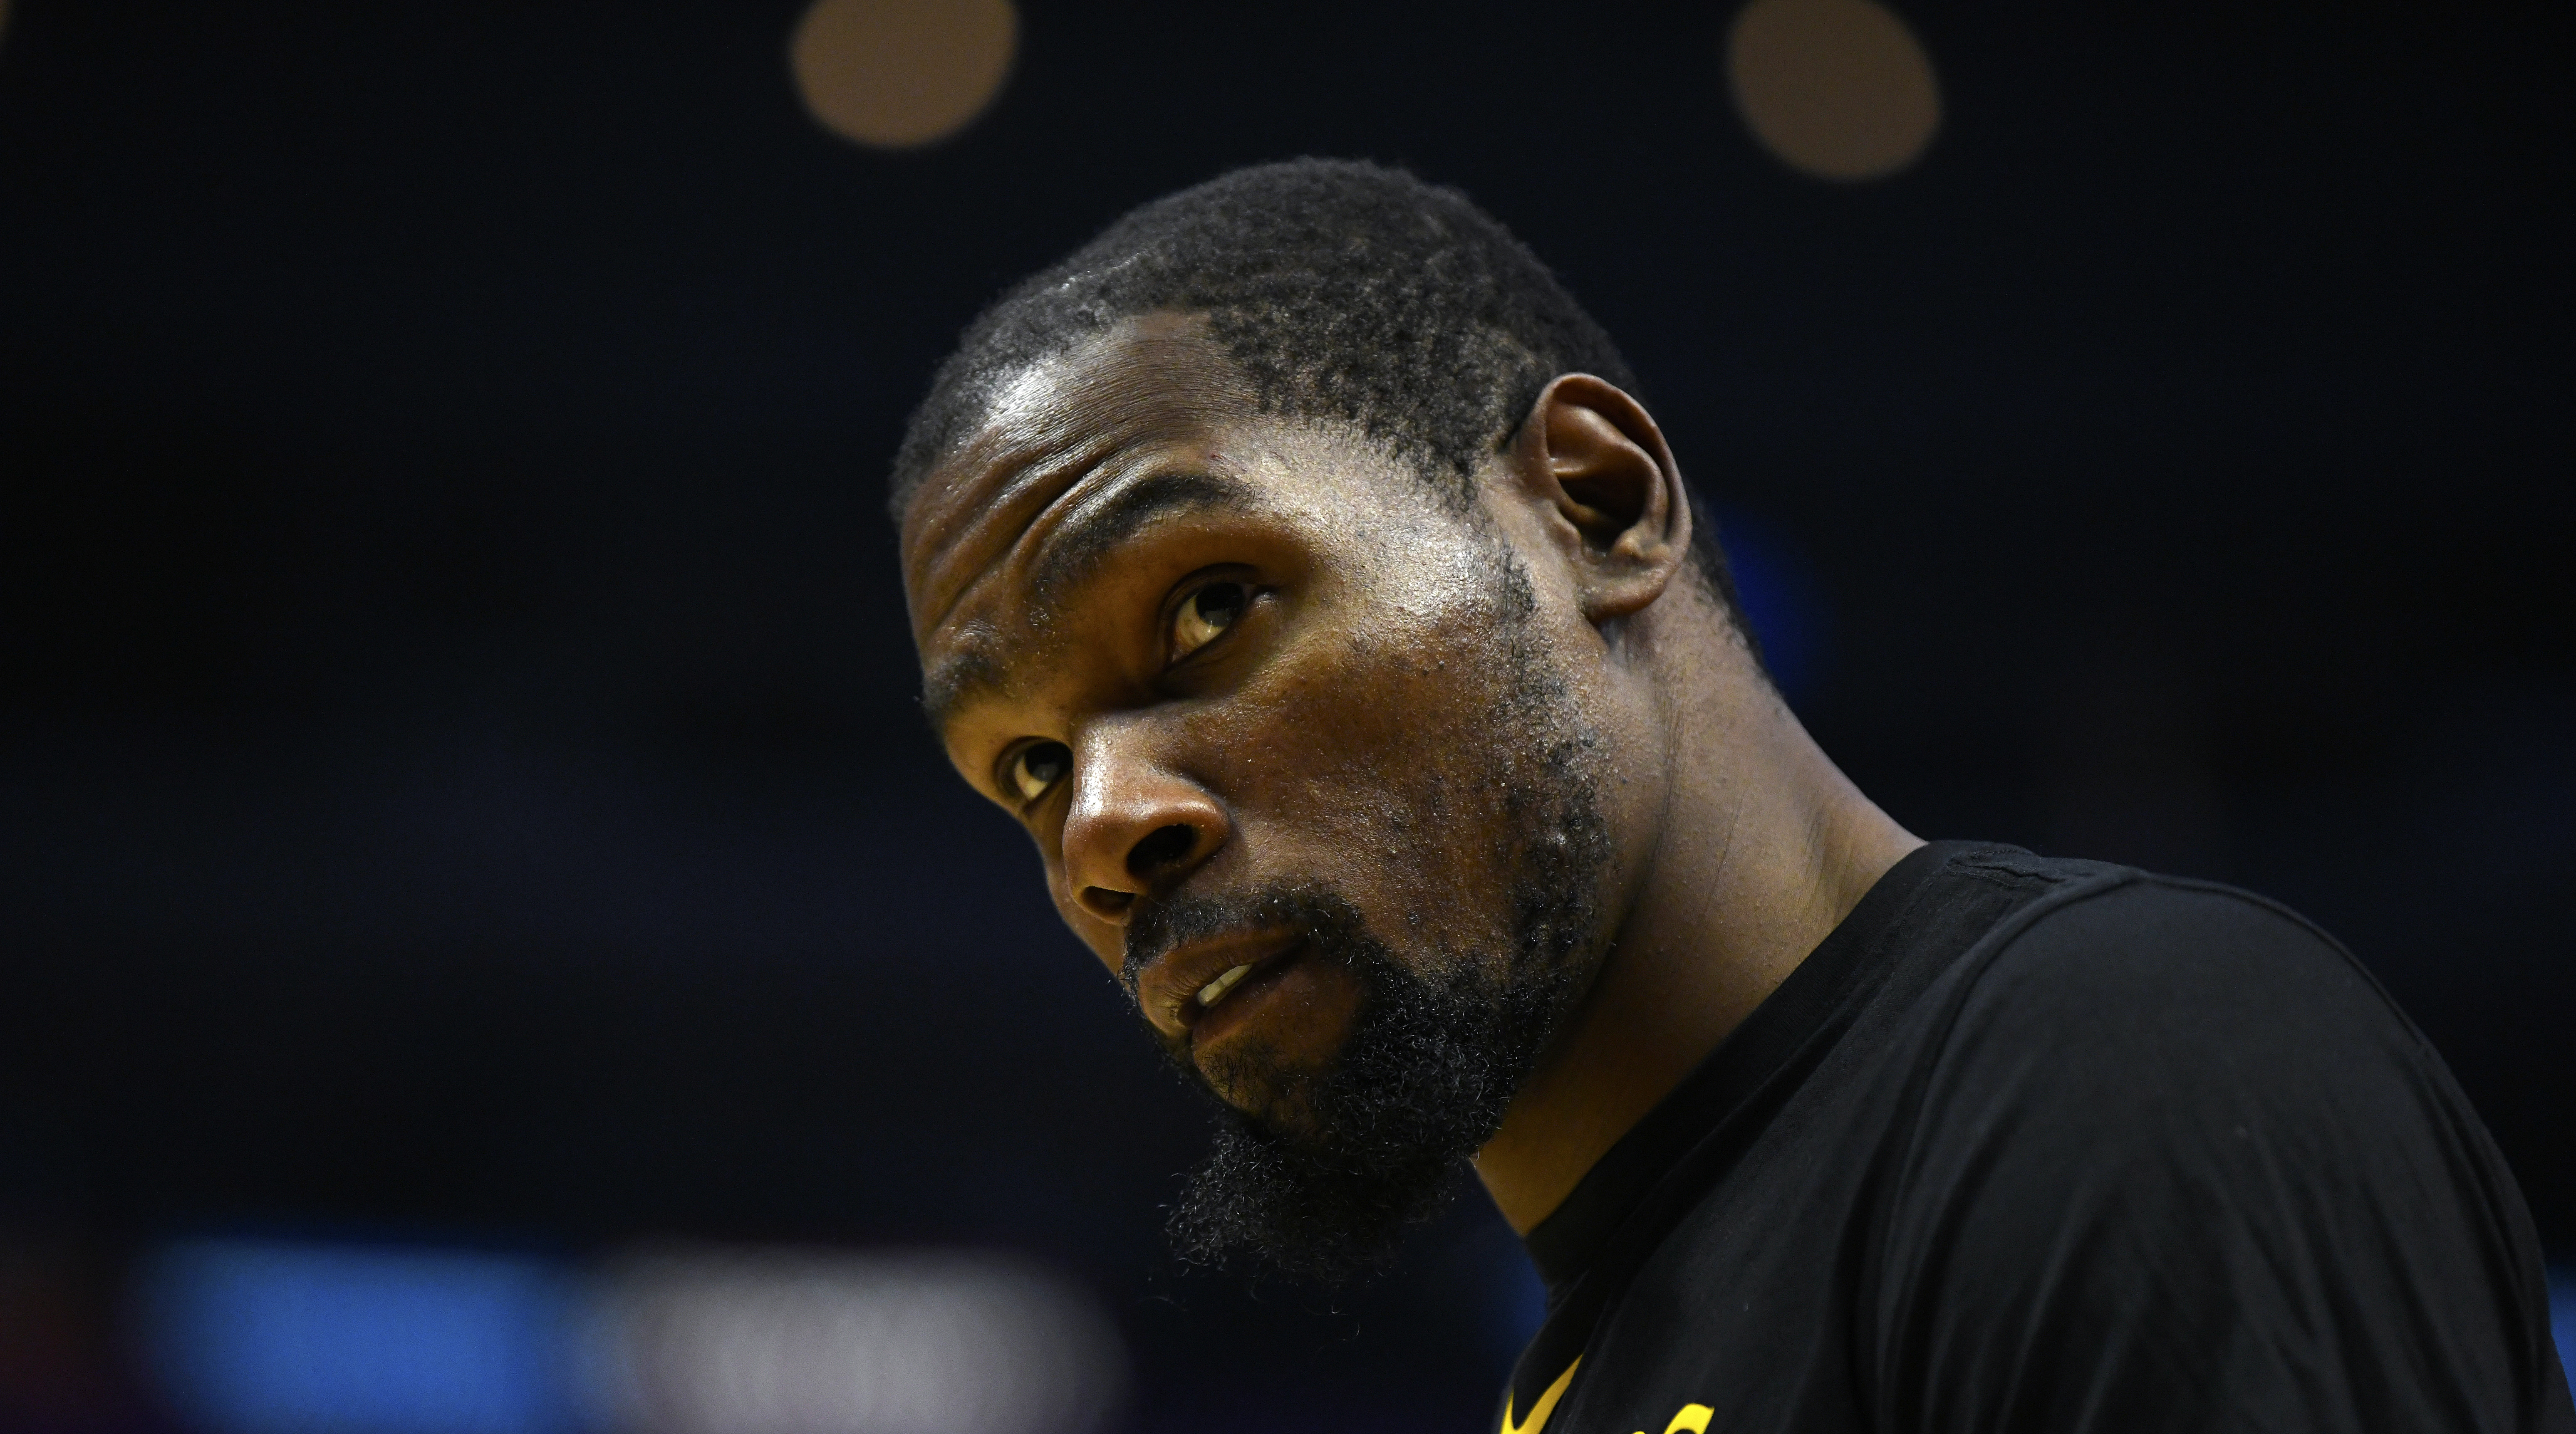 buy online 6d0e6 4c14b Kevin Durant fined  25,000 for cursing at Mavericks fan   SI.com